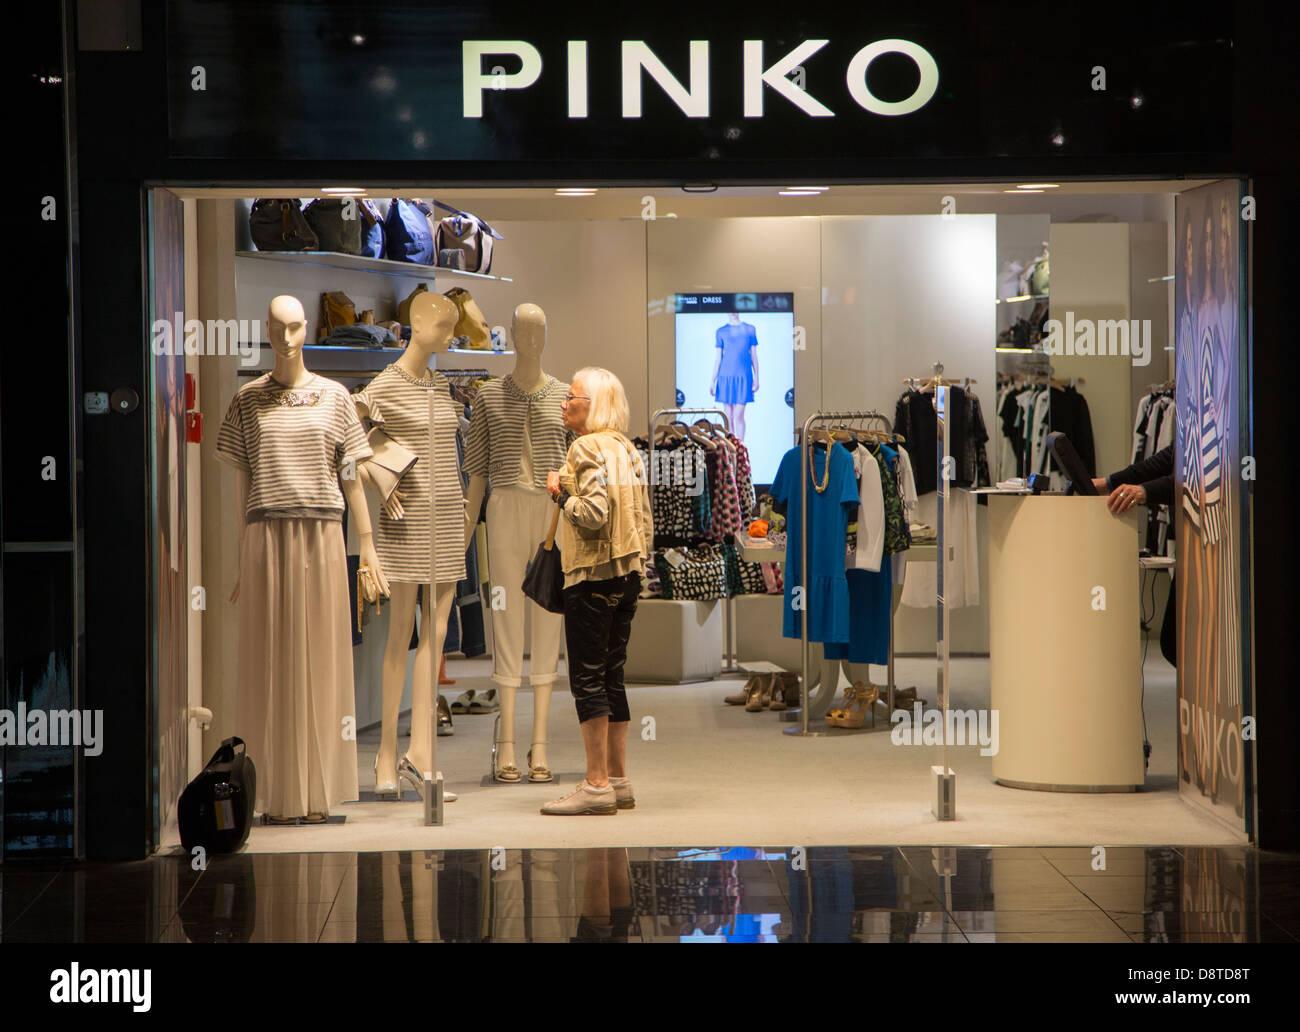 hot sale online 7fe5f de83a Pinko shop Fiumicino Airport, Rome, Italy Stock Photo ...